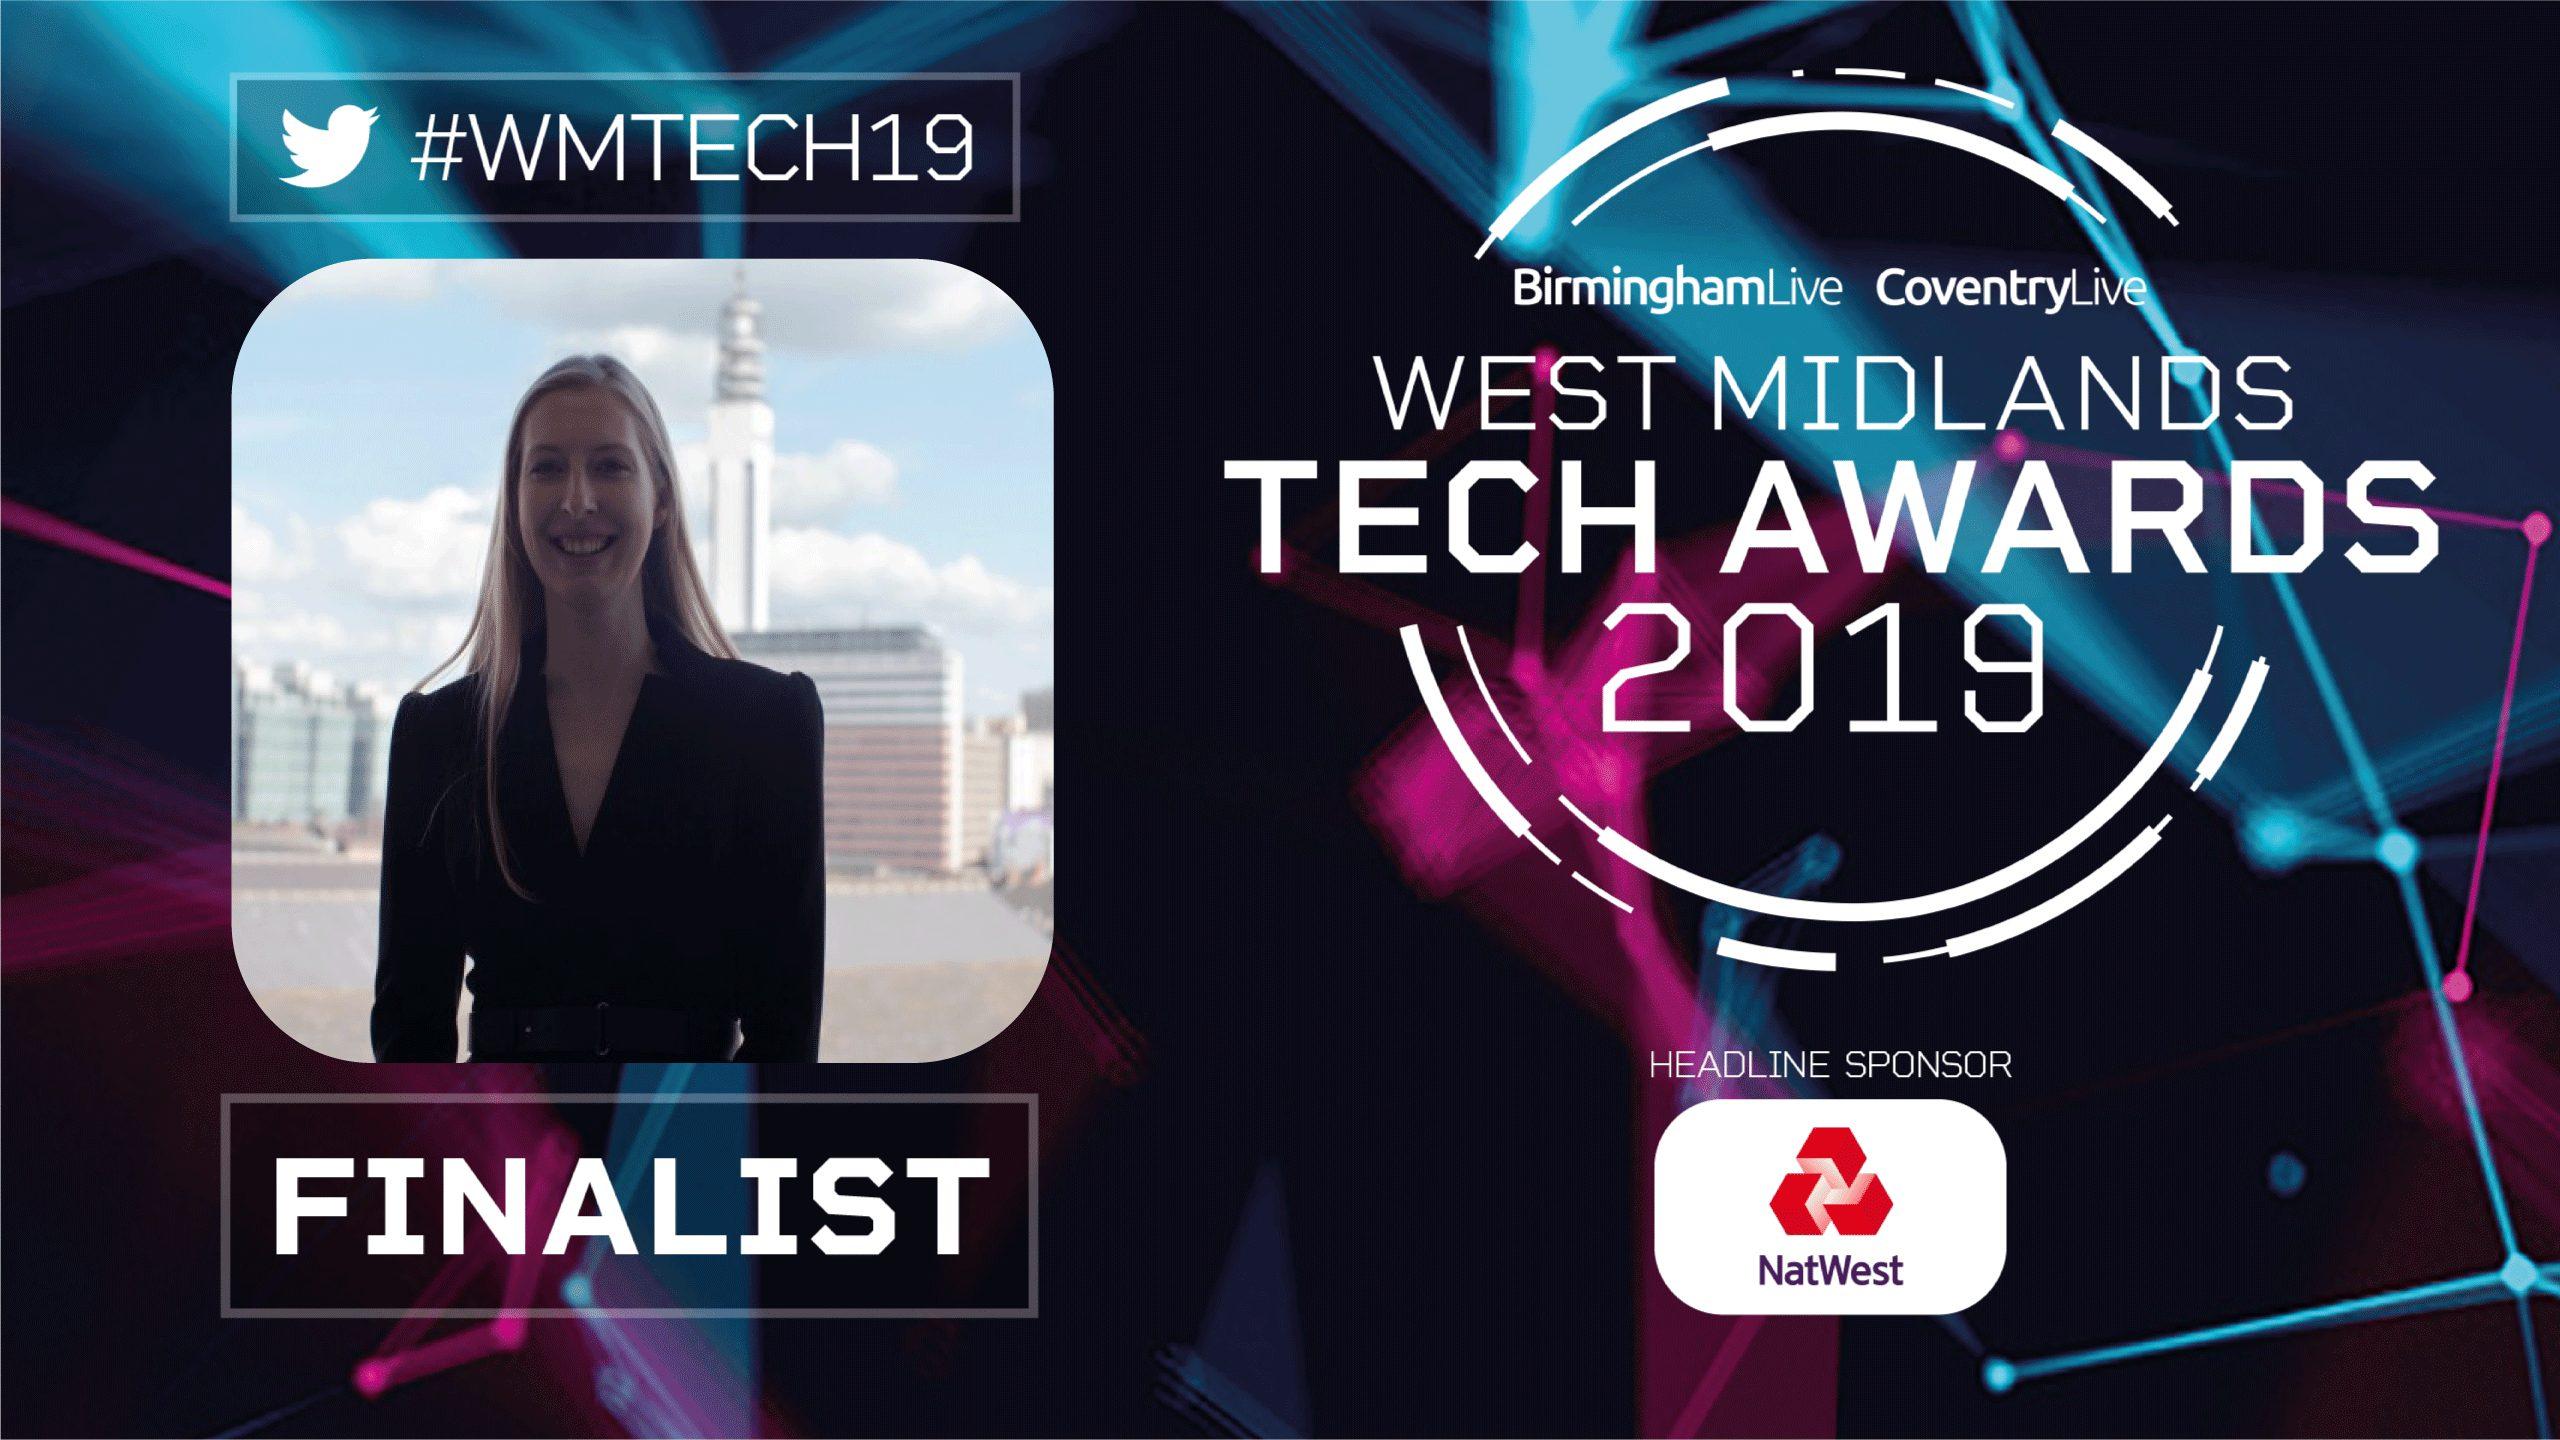 West Midlands Tech Awards Finalist 2019 Natural HR